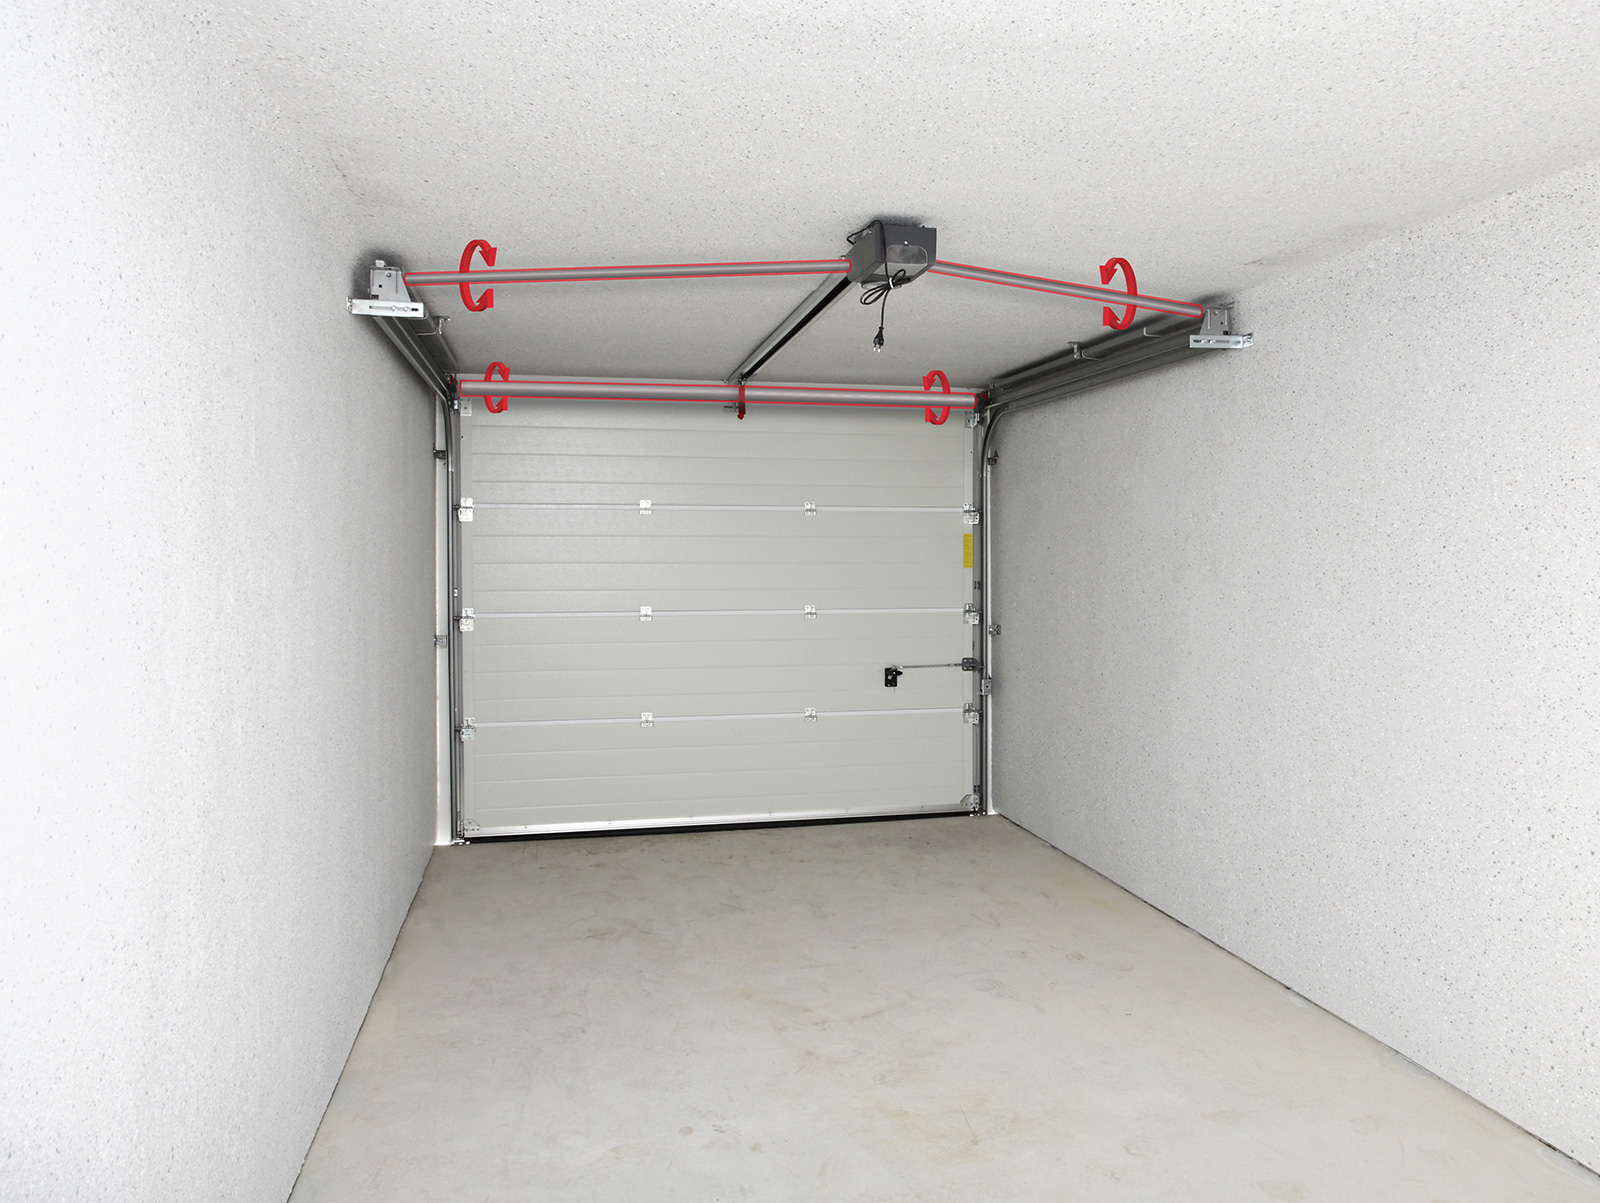 installer des ressorts de torsion porte de garage